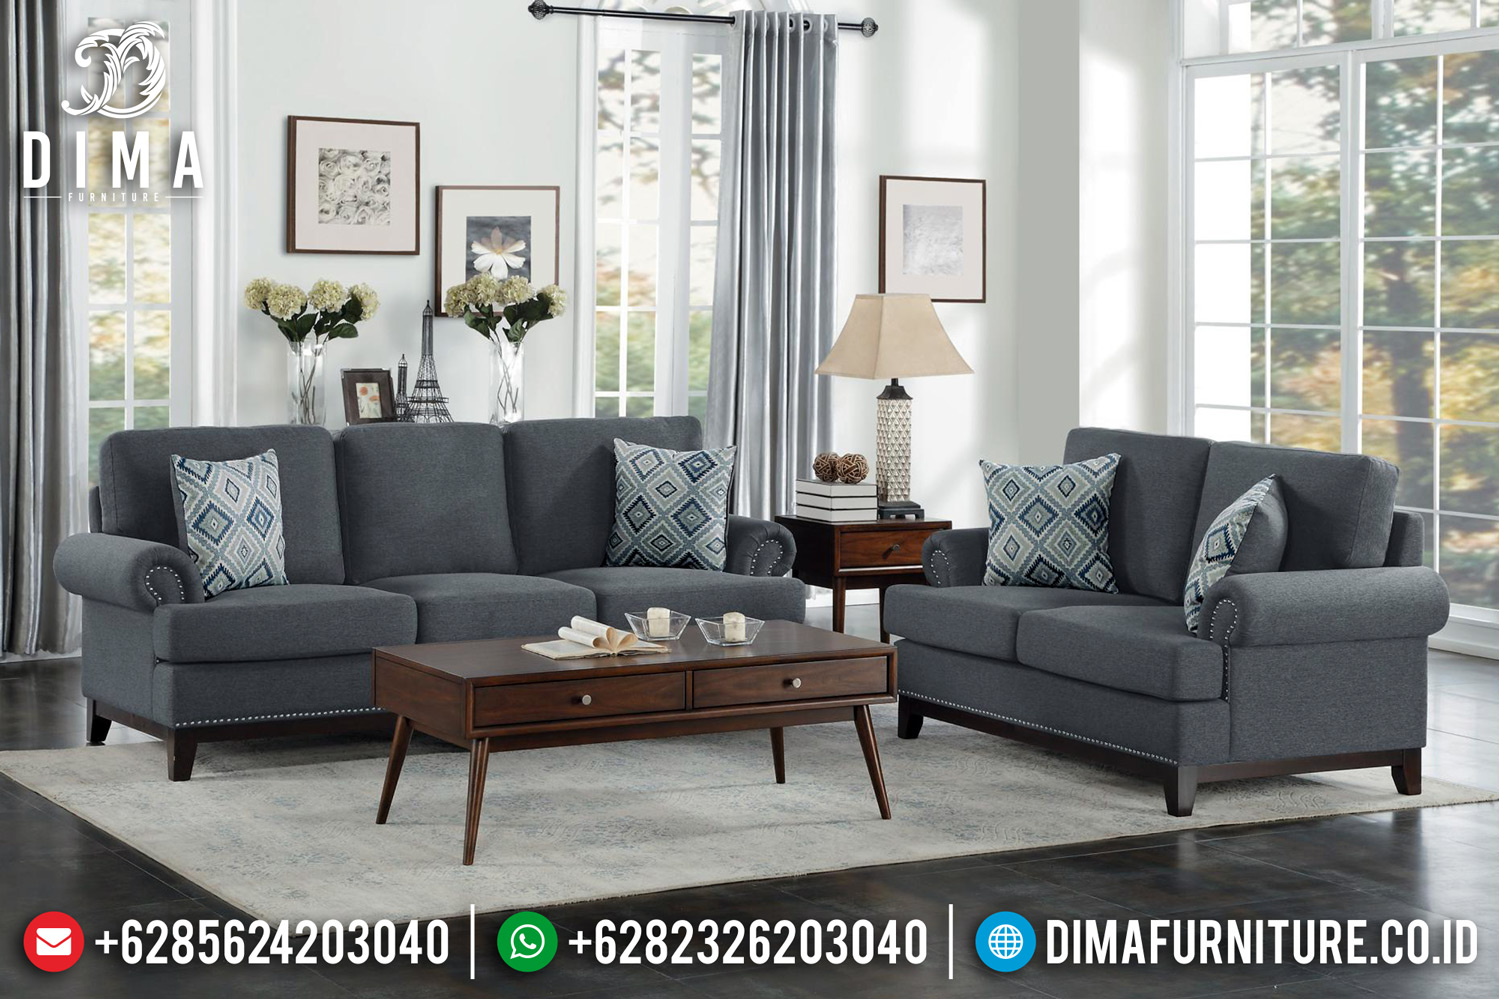 New Sofa Tamu Minimalis Modern Kayu Jati Perhutani BT-0430